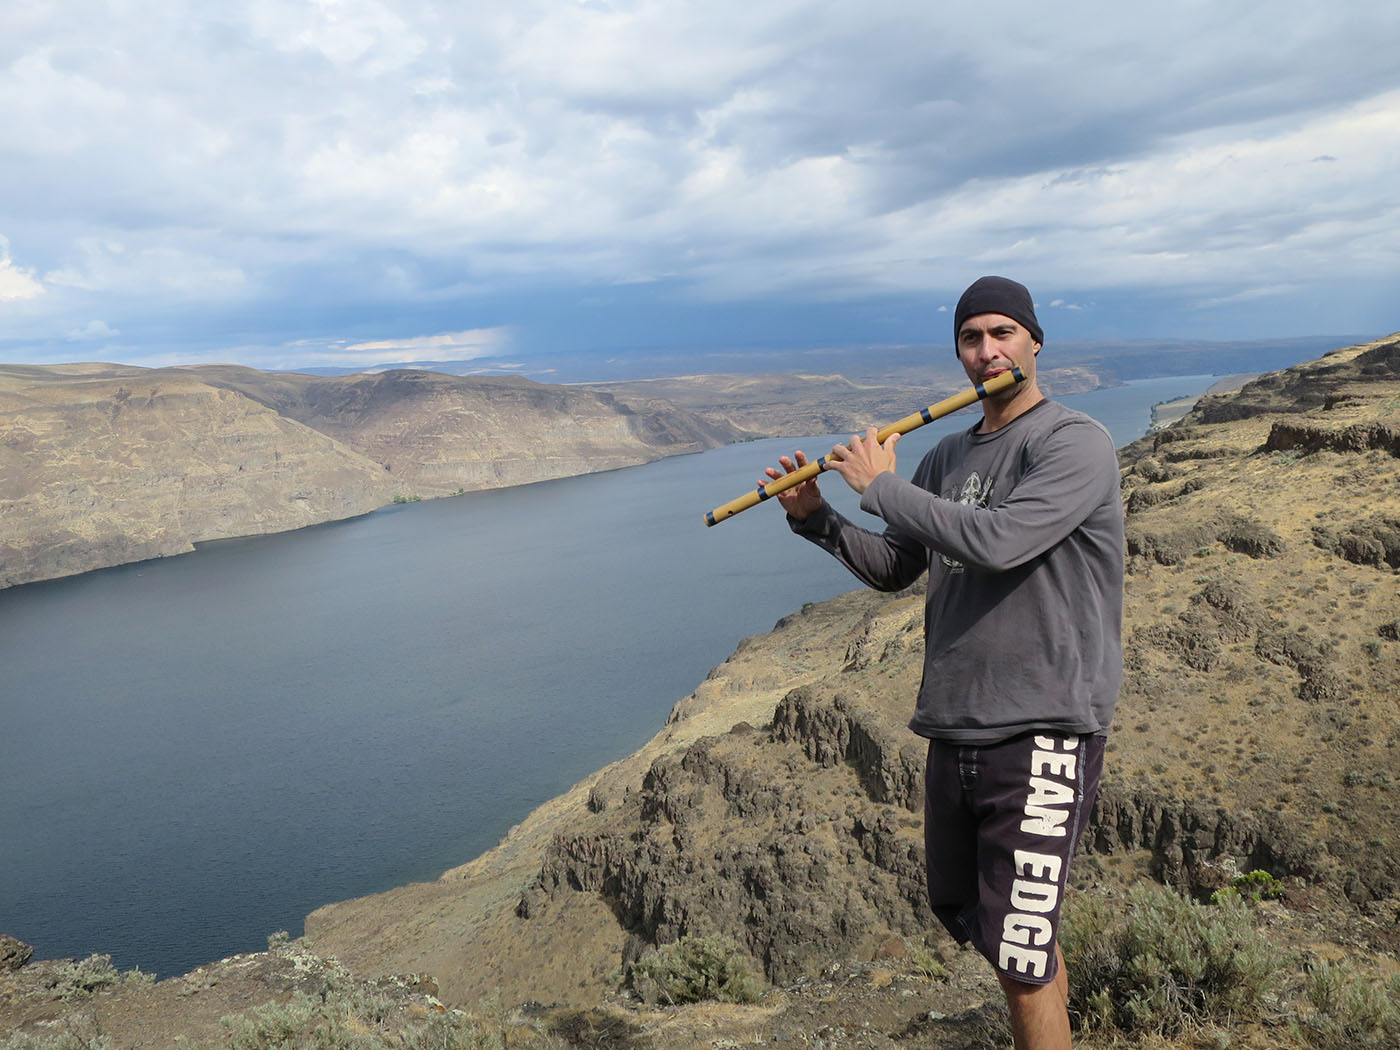 USA WA Kerry Kriger Bansuri Flute Wanapum-Overlook-Columbia-River-2016